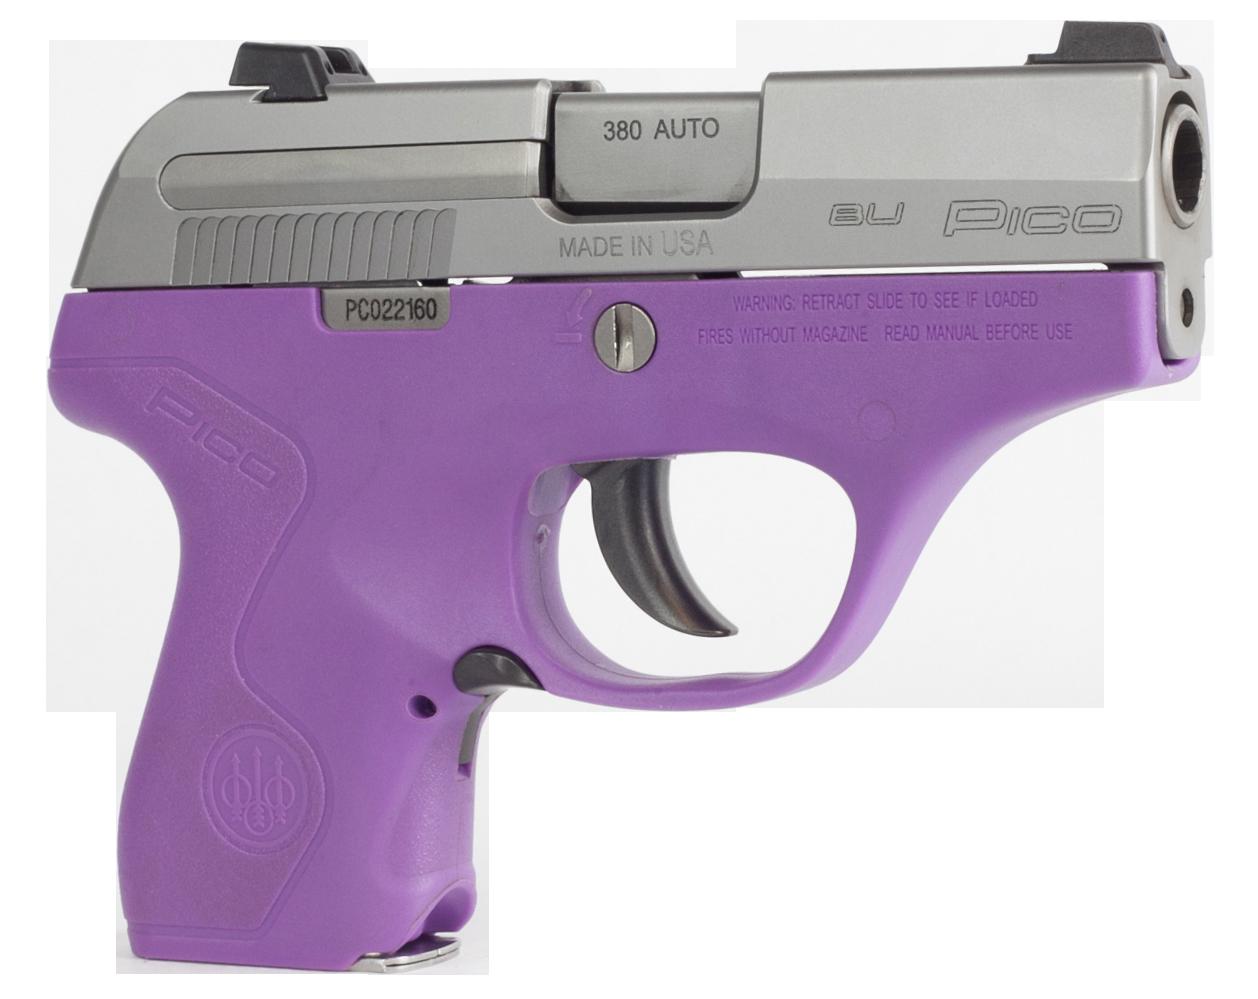 Beretta 380 Pico-img-7